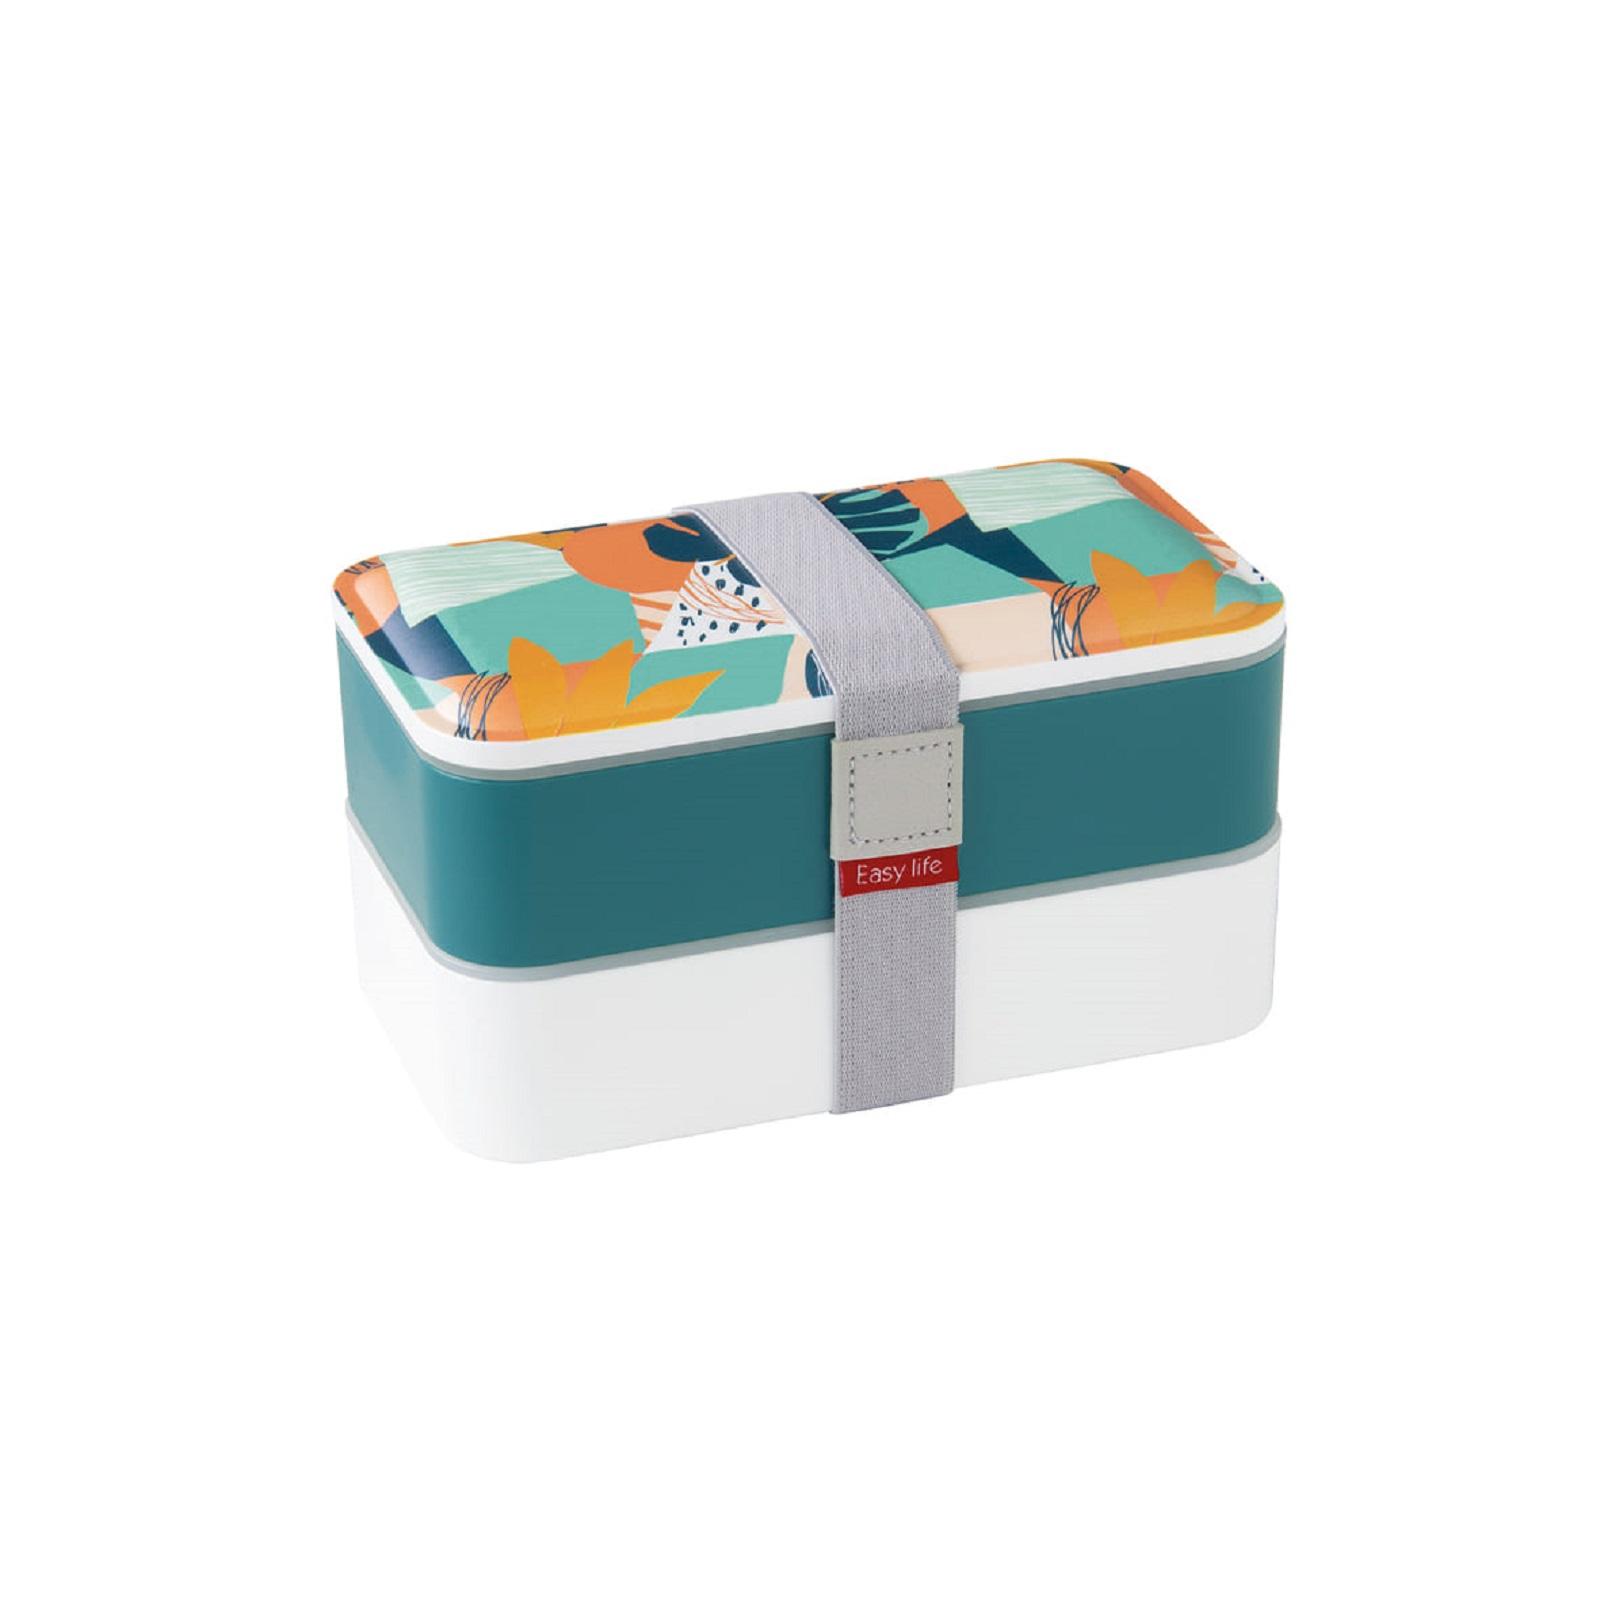 Онлайн каталог PROMENU: Ланч-бокс Easy Life, объем 18,5 x 10,5 x 10  см, белый с синим  2500 ABS2